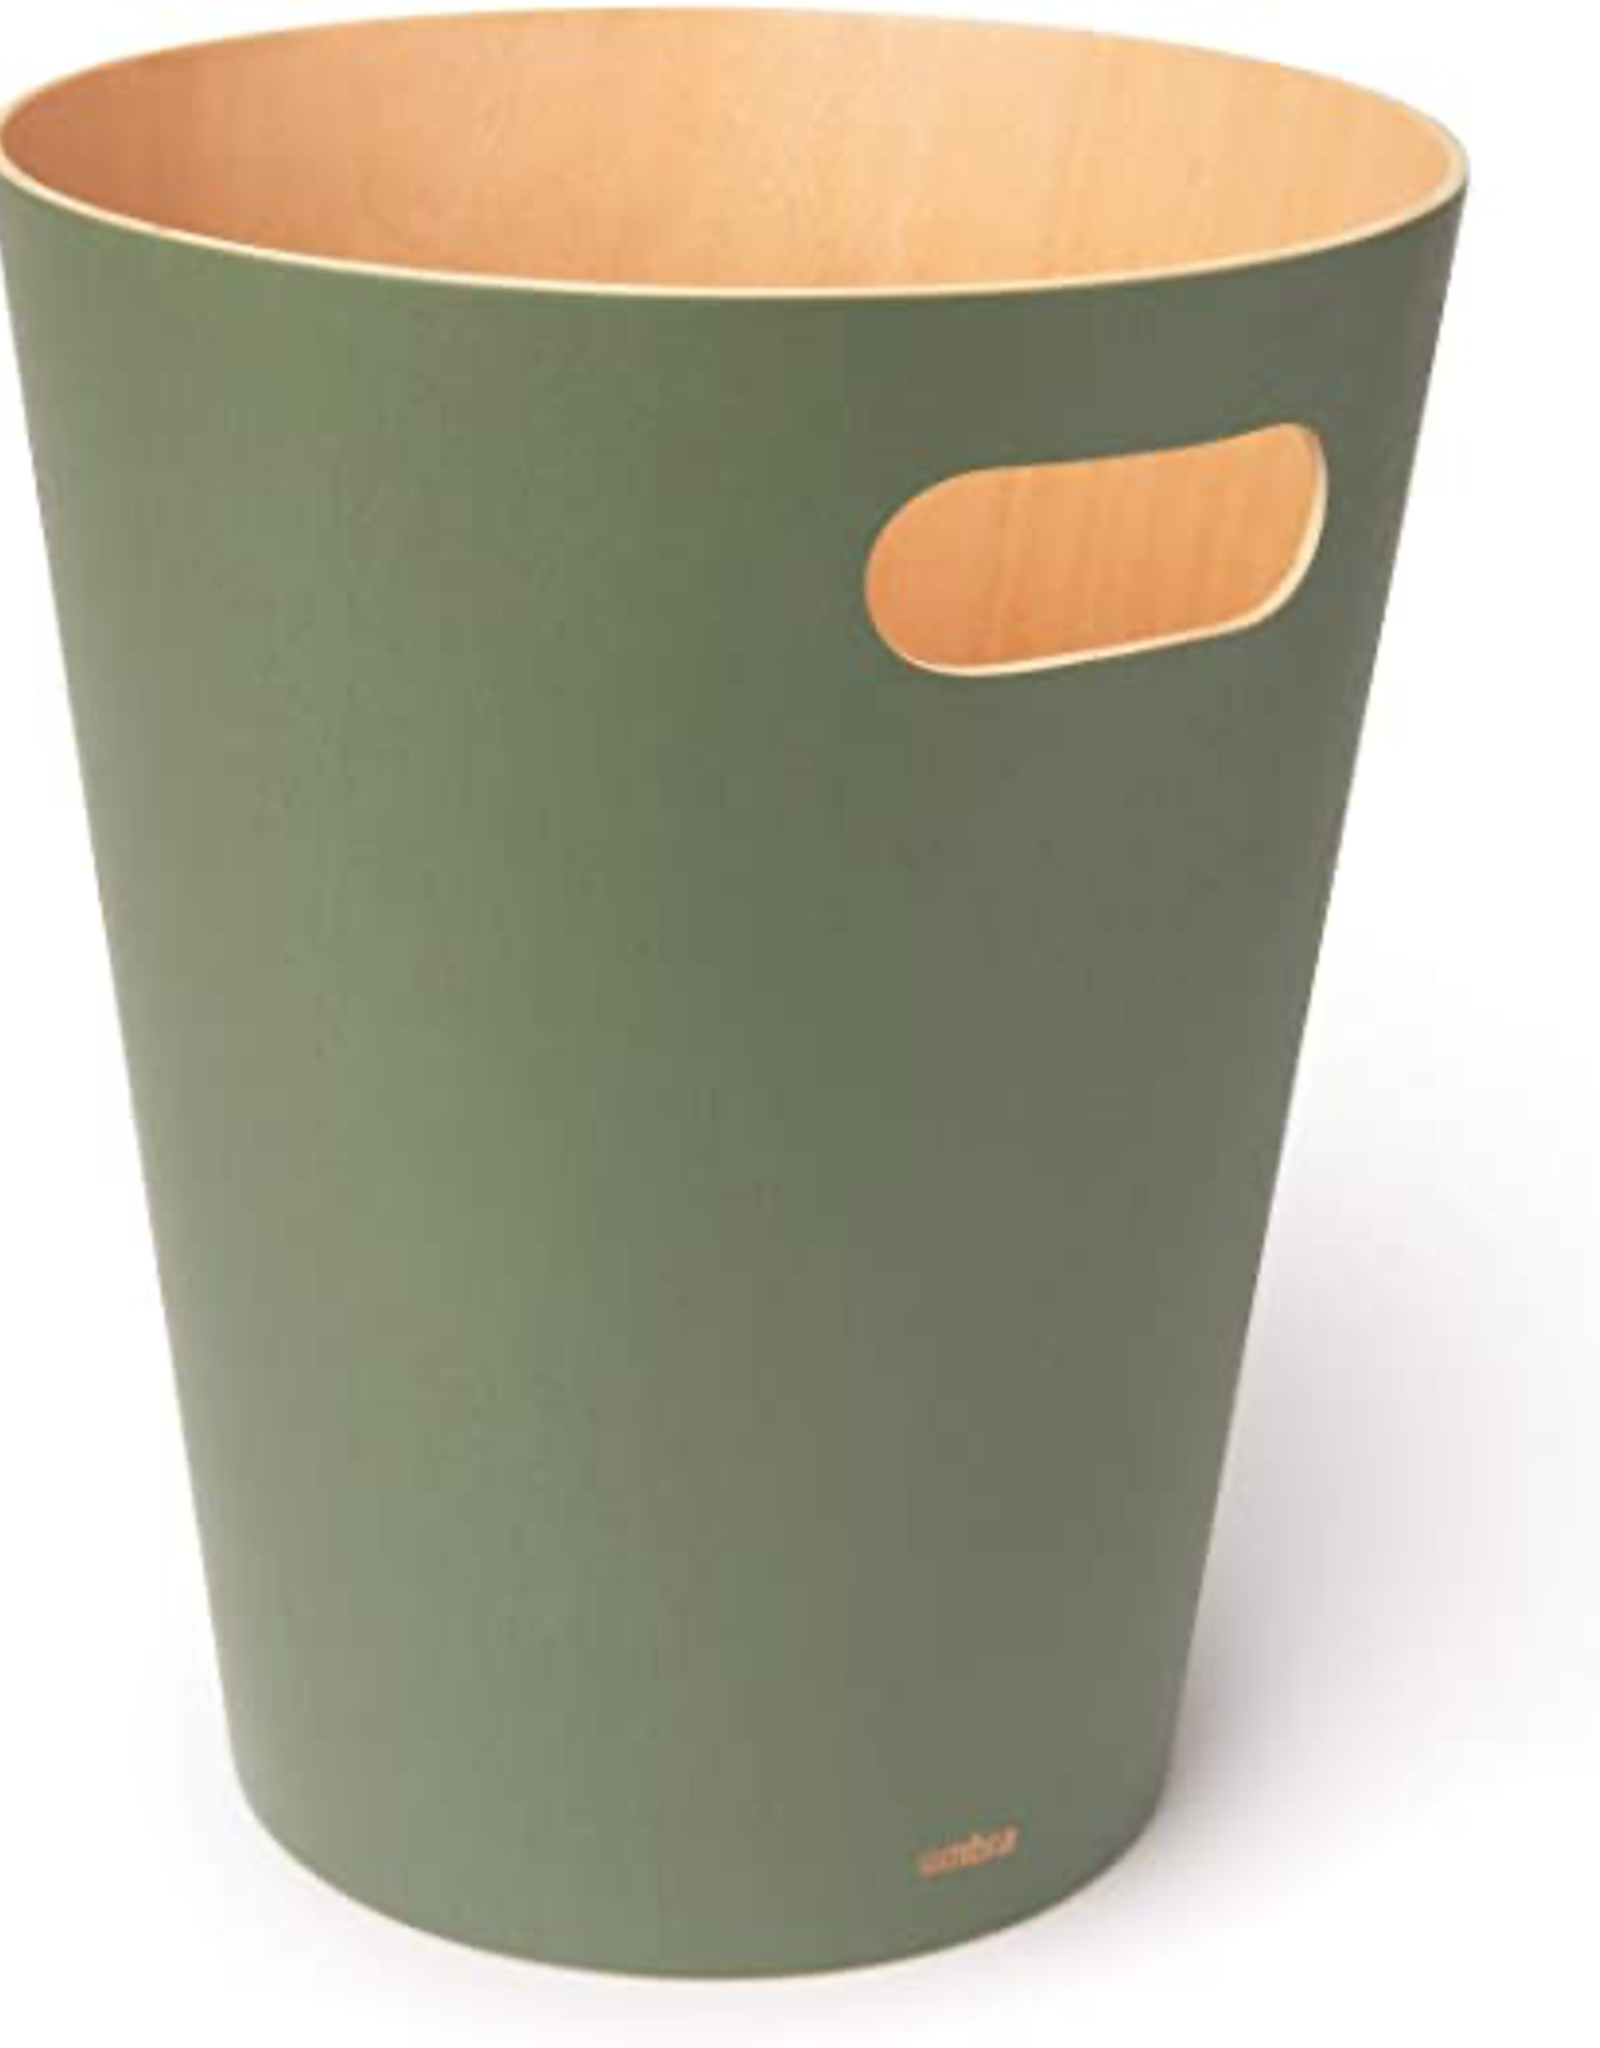 Umbra Umbra Woodrow Waste Bin-Spruce